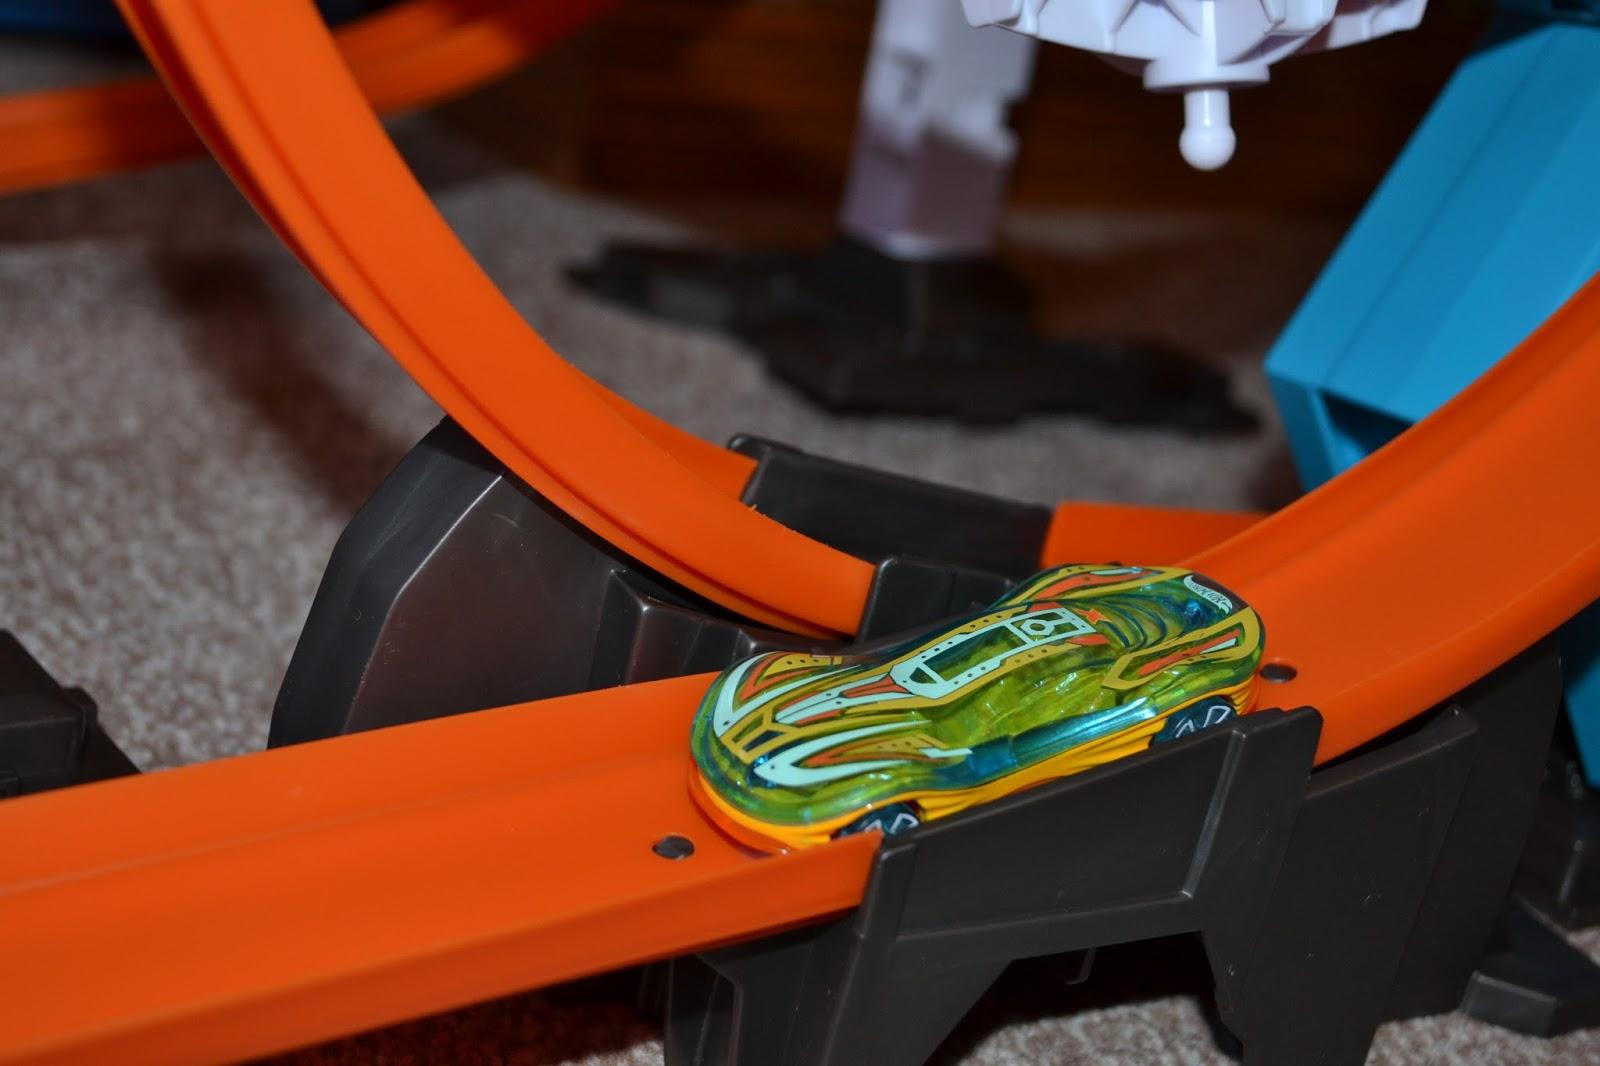 hot wheels power loop raceway instructions